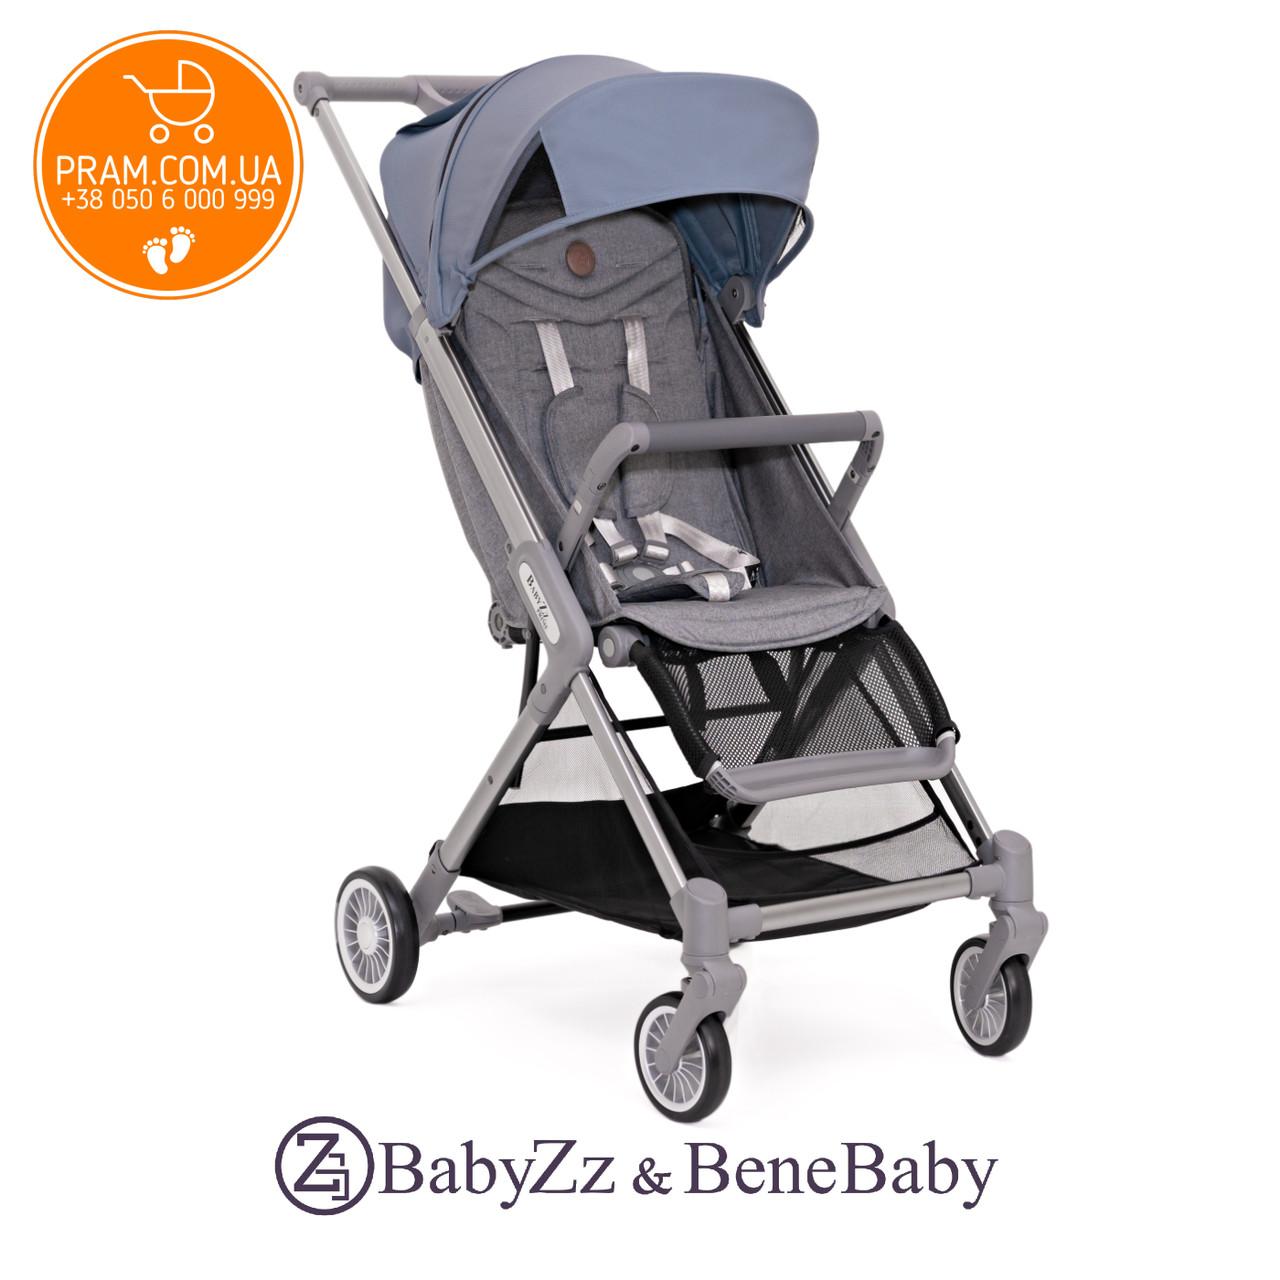 BABYZZ & BENE BABY PRIME прогулочная коляска Голубой